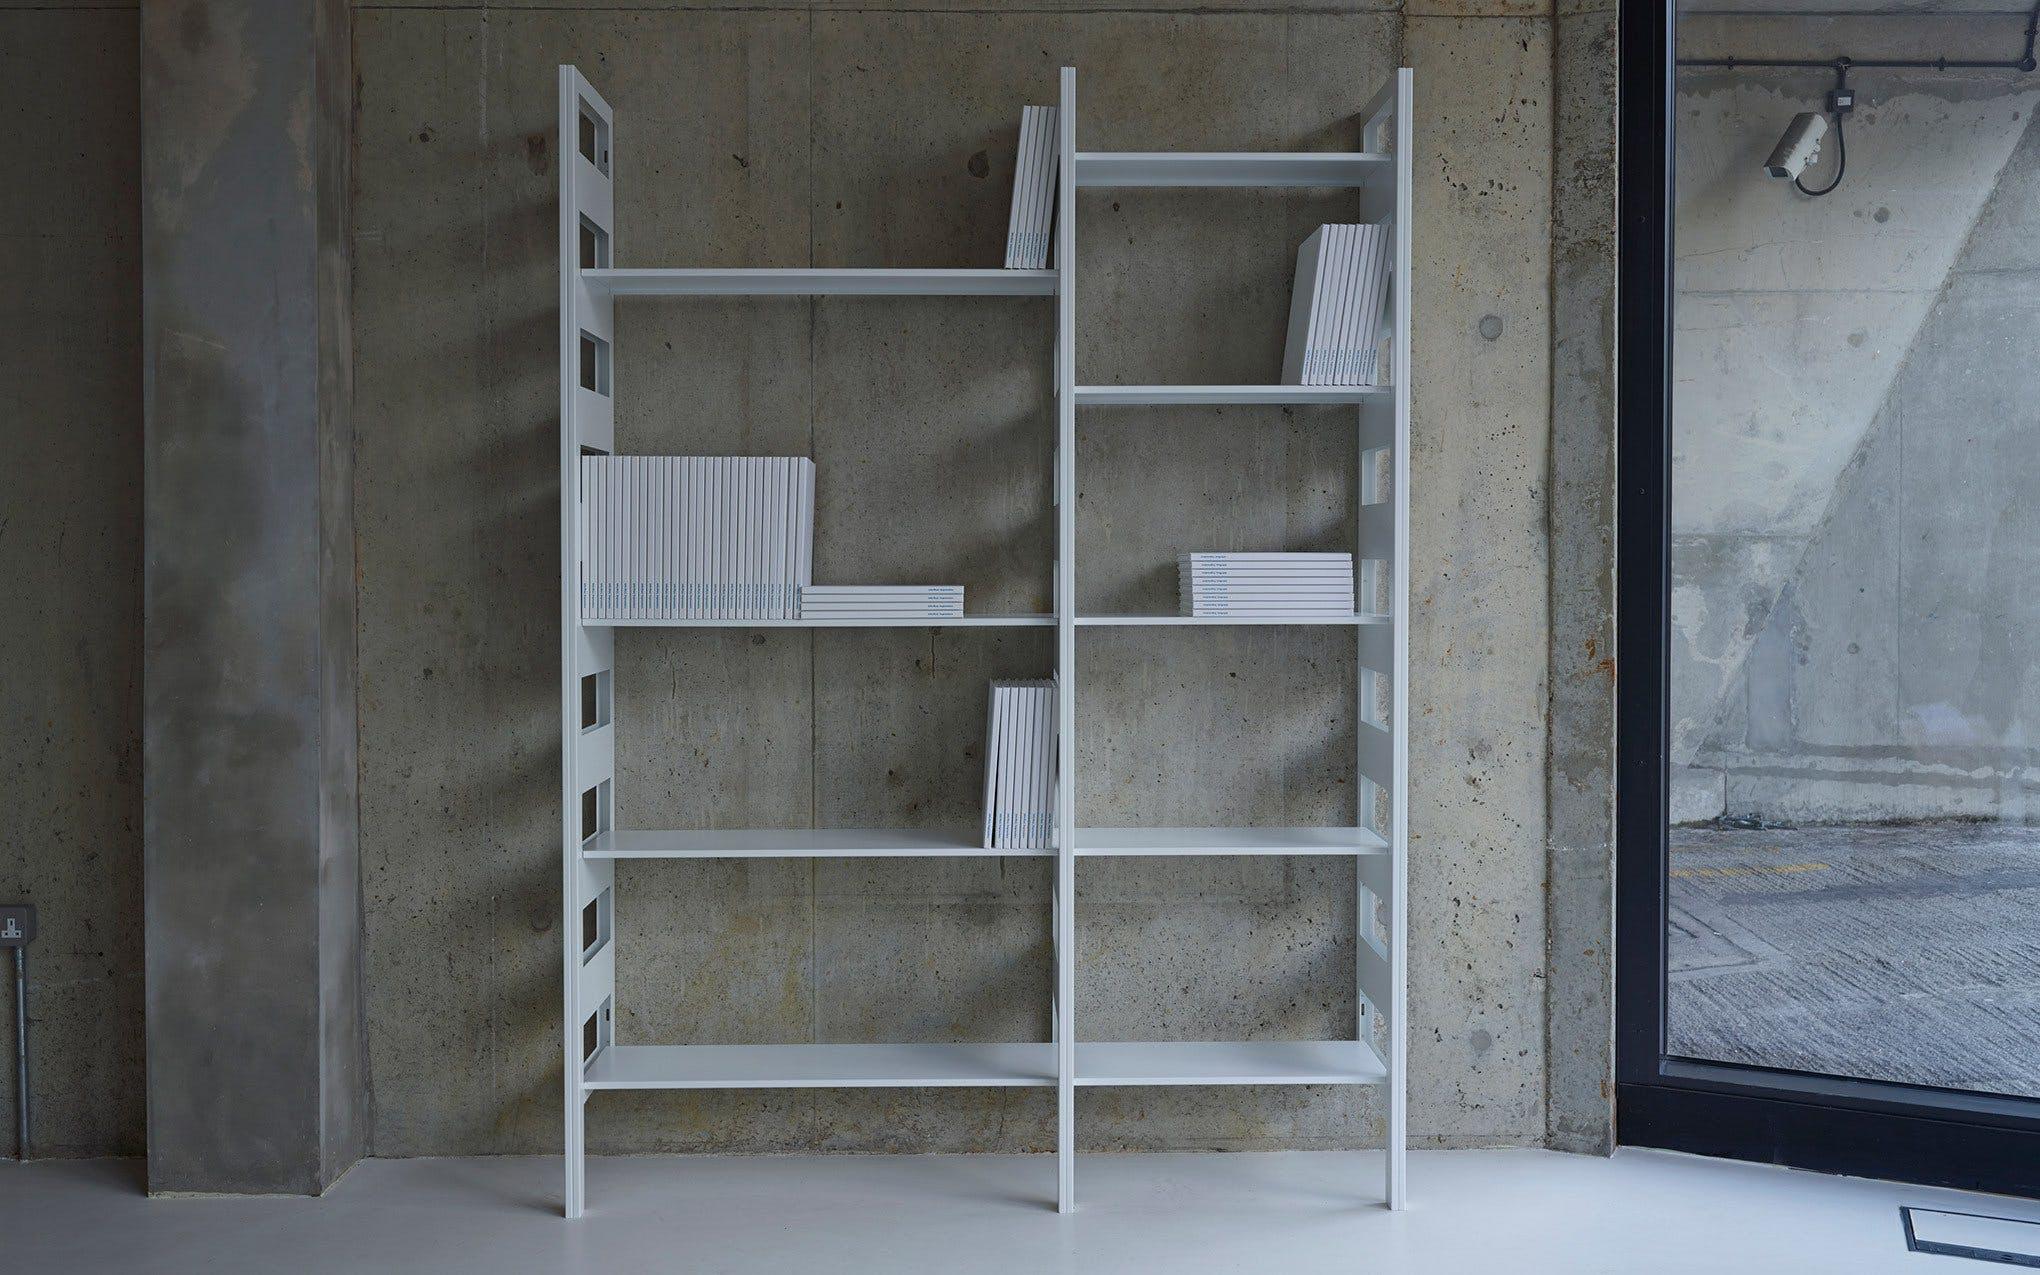 Parallel Shelves 4